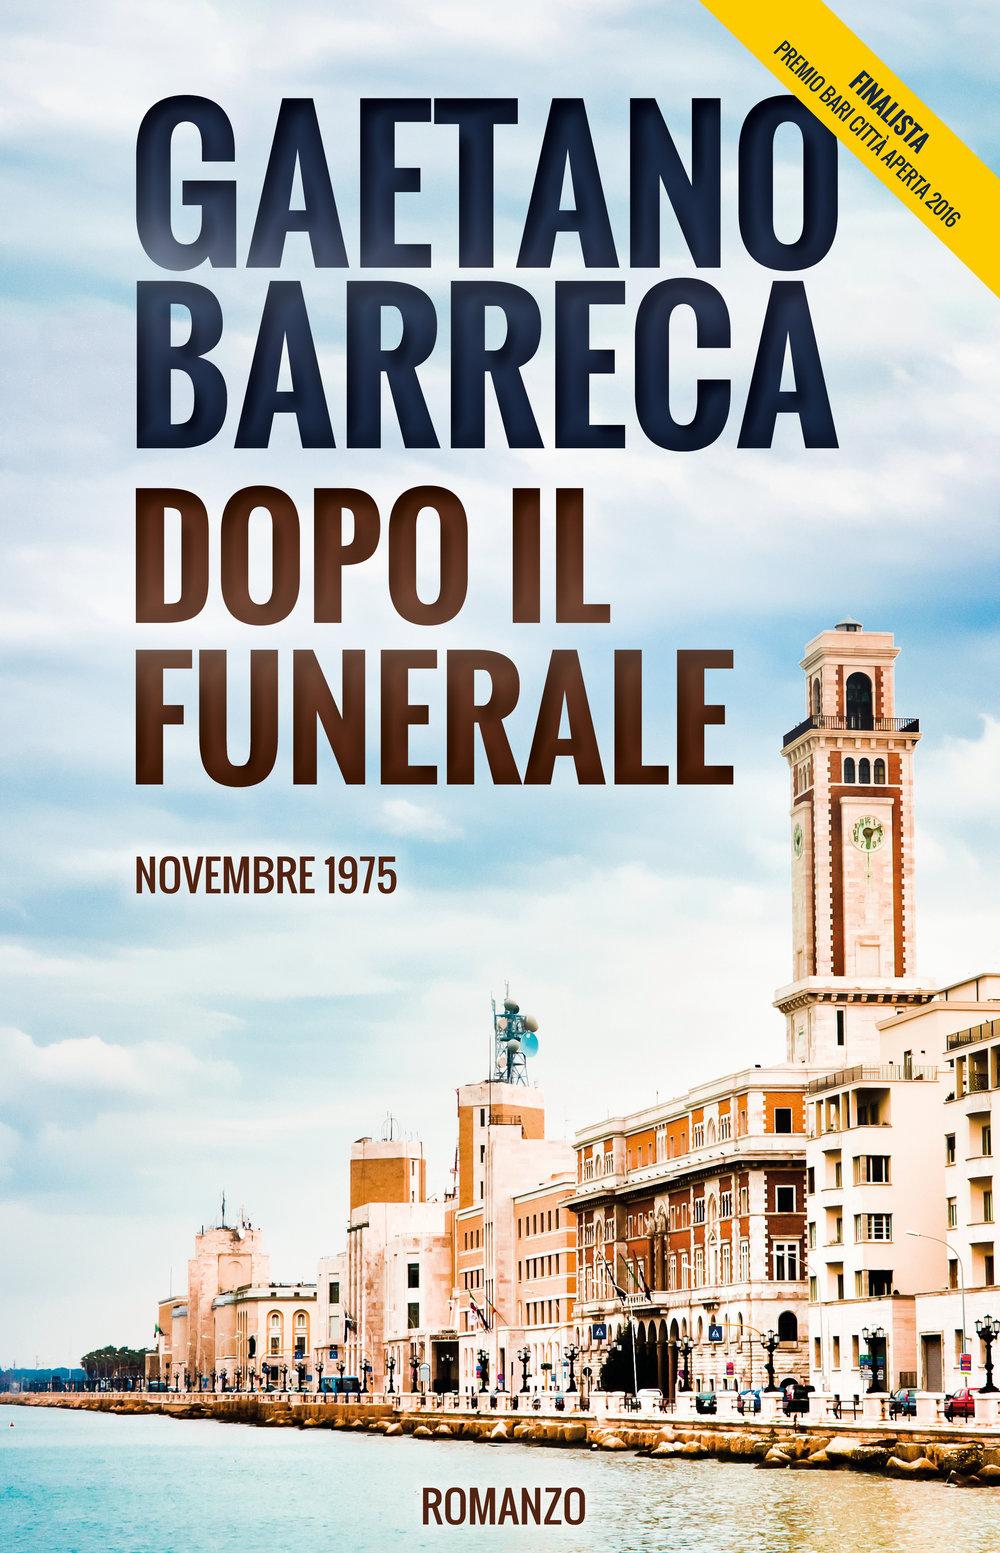 Gaetano Barreca - Dopo il Funerale - Cover Kindle.jpg